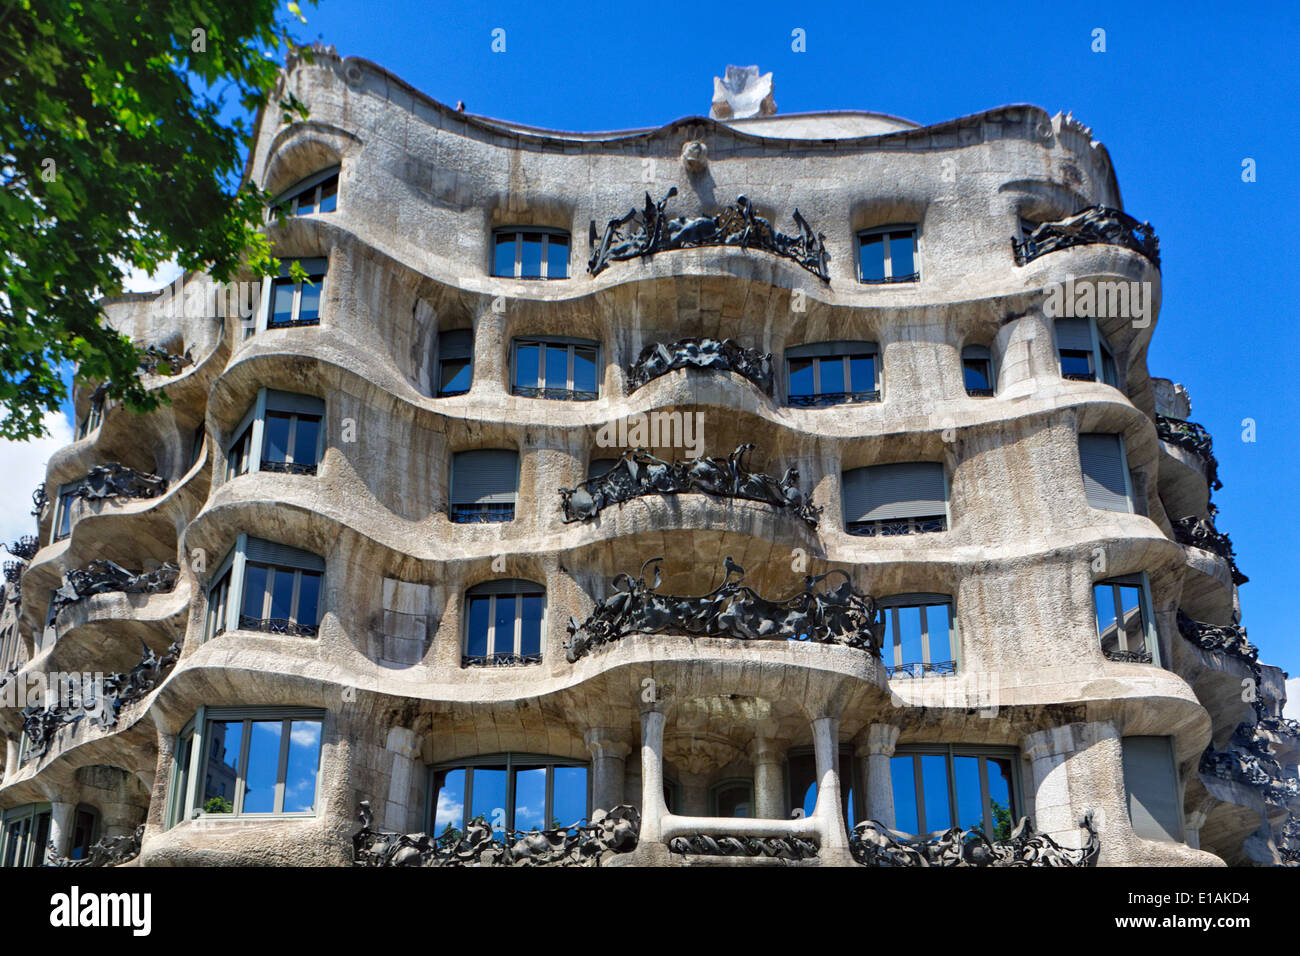 Low Angle View of a Building Facade, Casa Mila (La Pedrerea), Barcelona, Catalonia, Spain - Stock Image